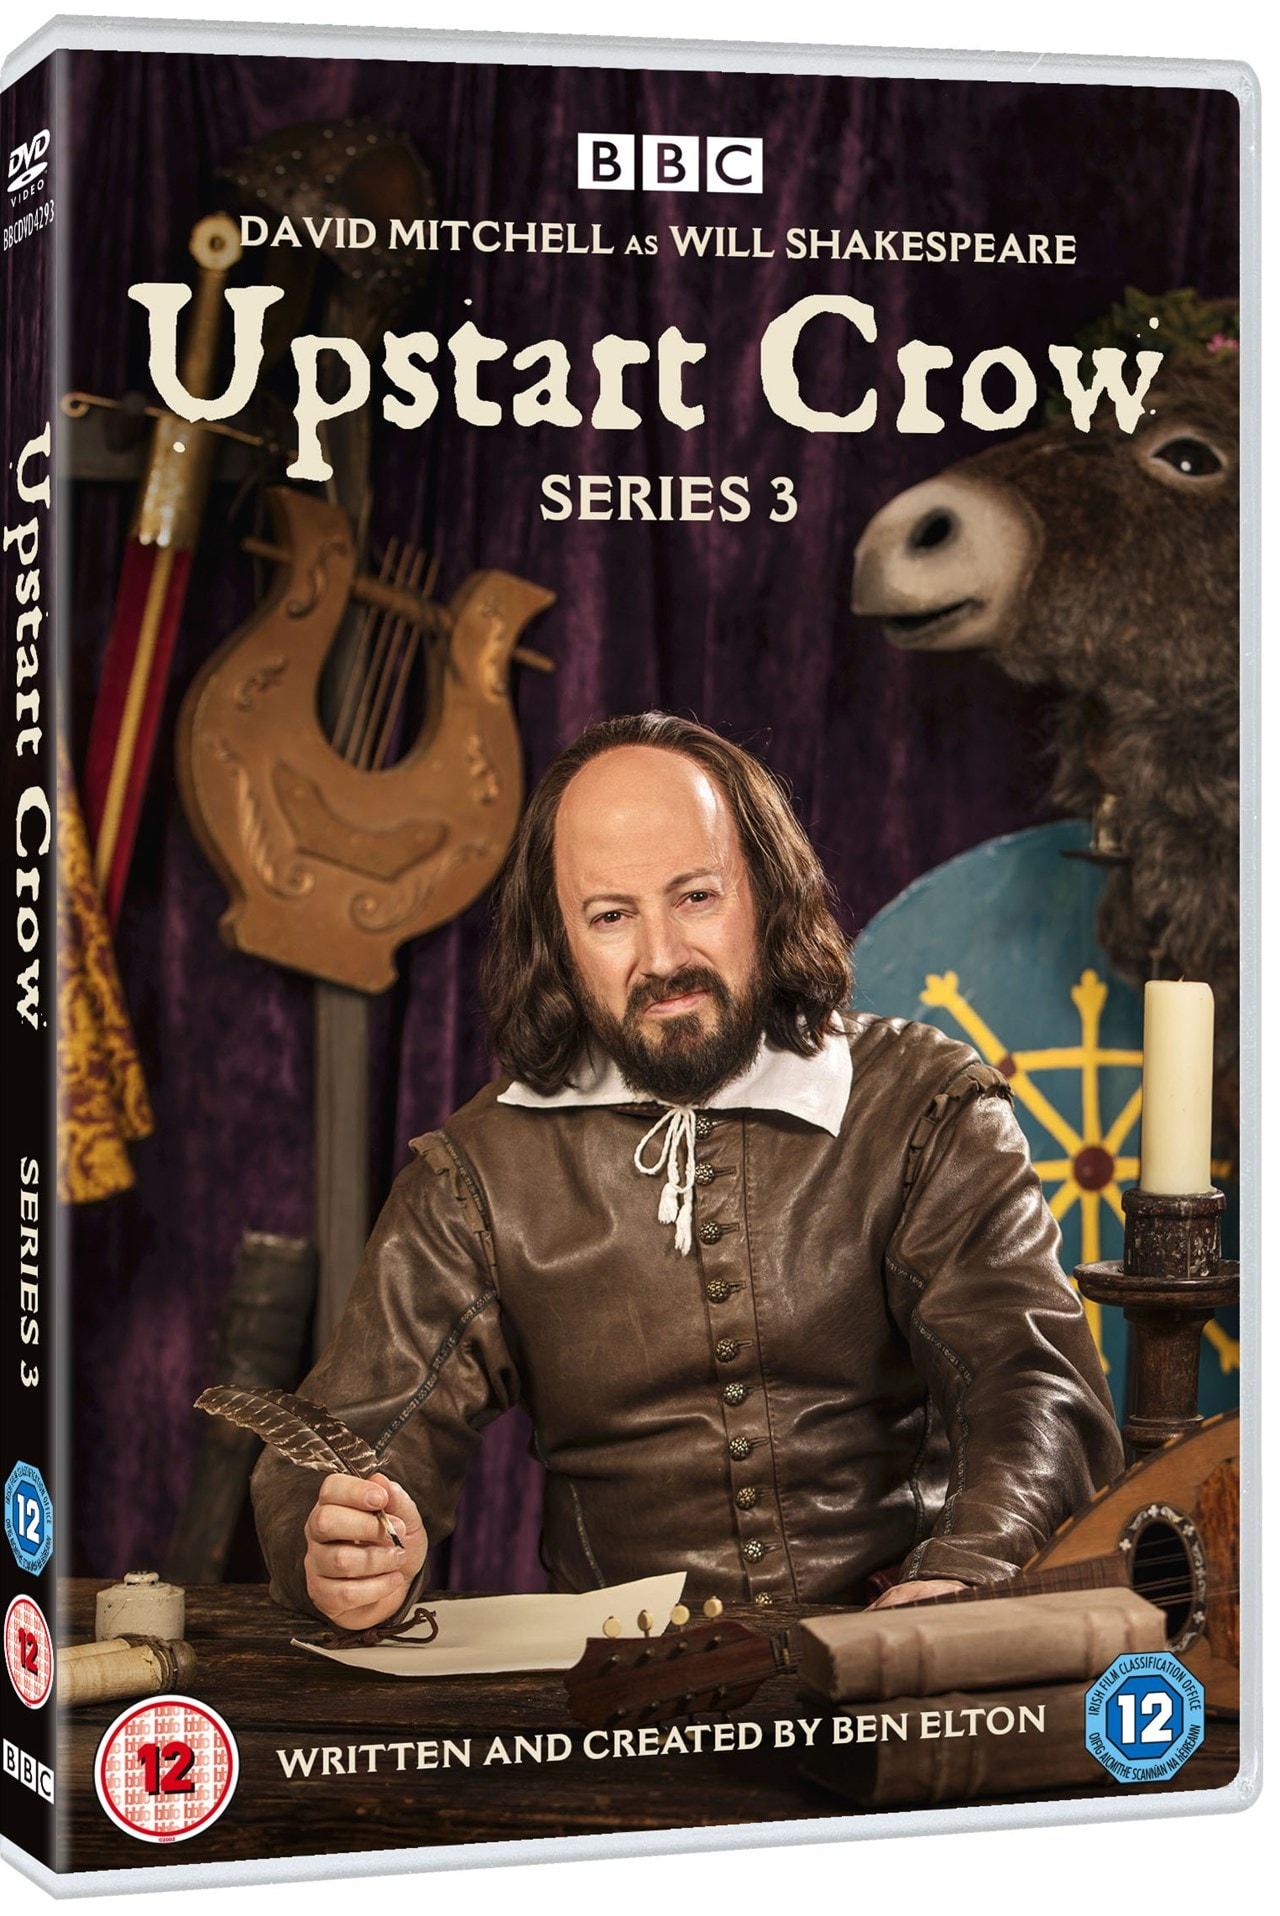 Upstart Crow: Series 3 - 2